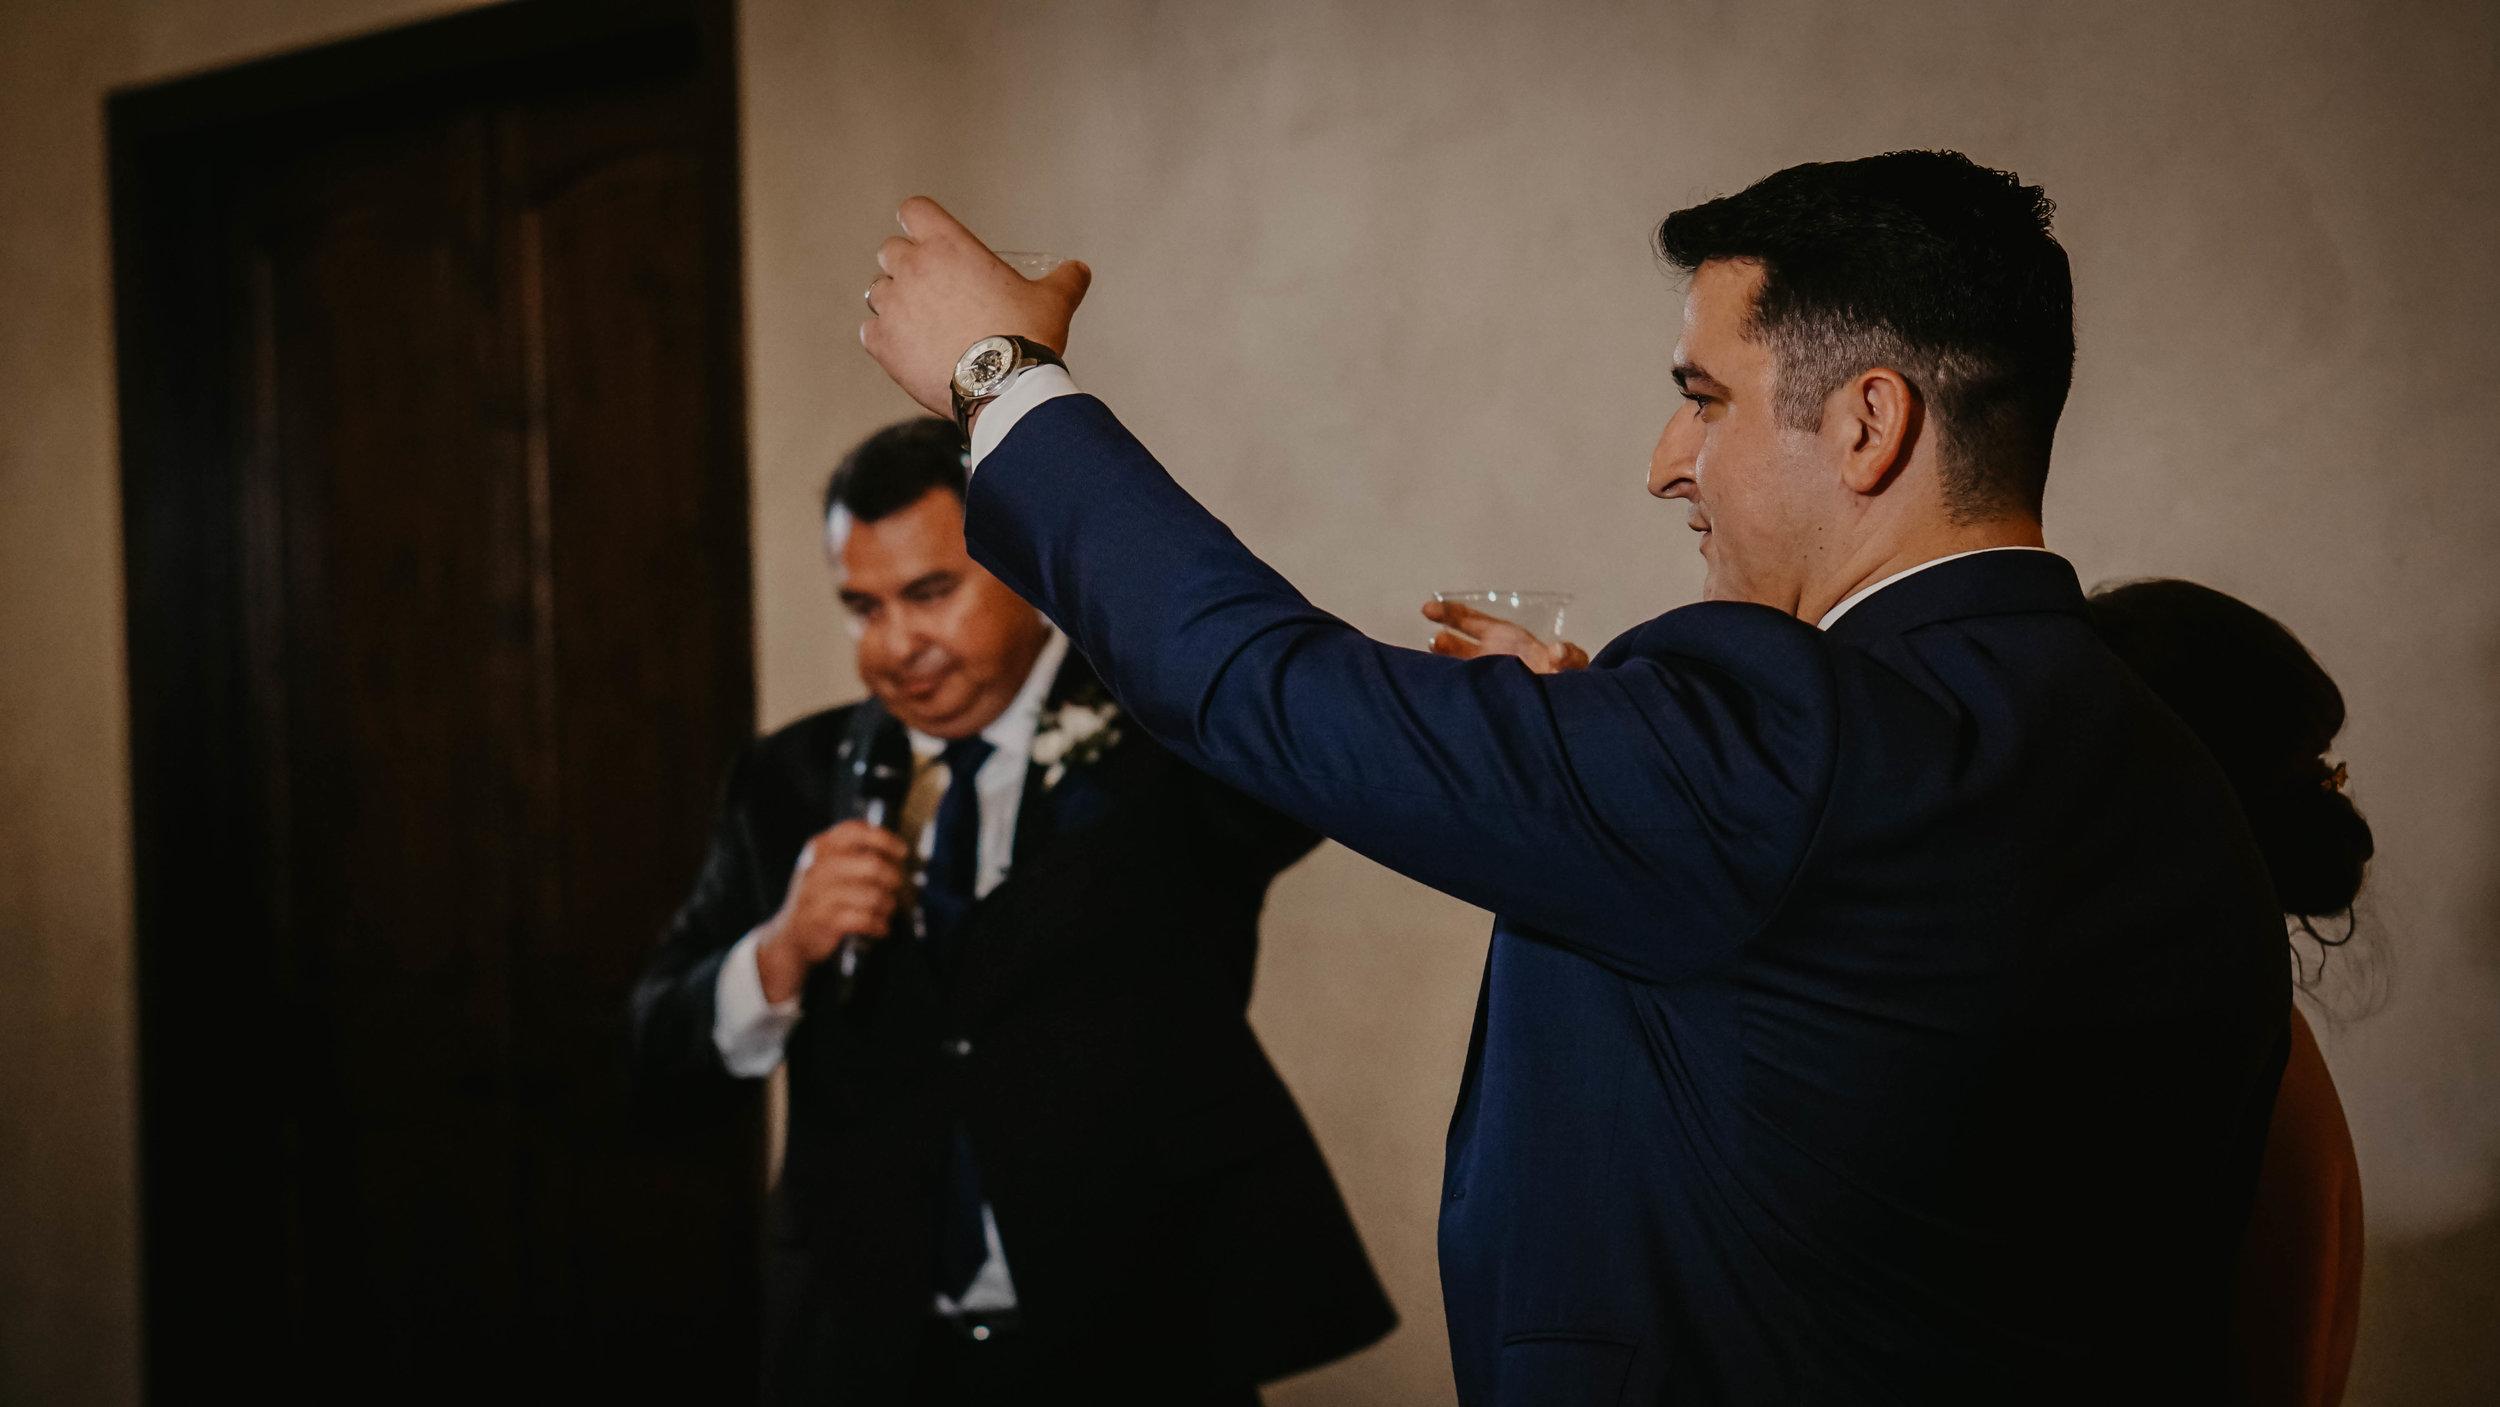 austin-wedding-videographer (98 of 999).jpg